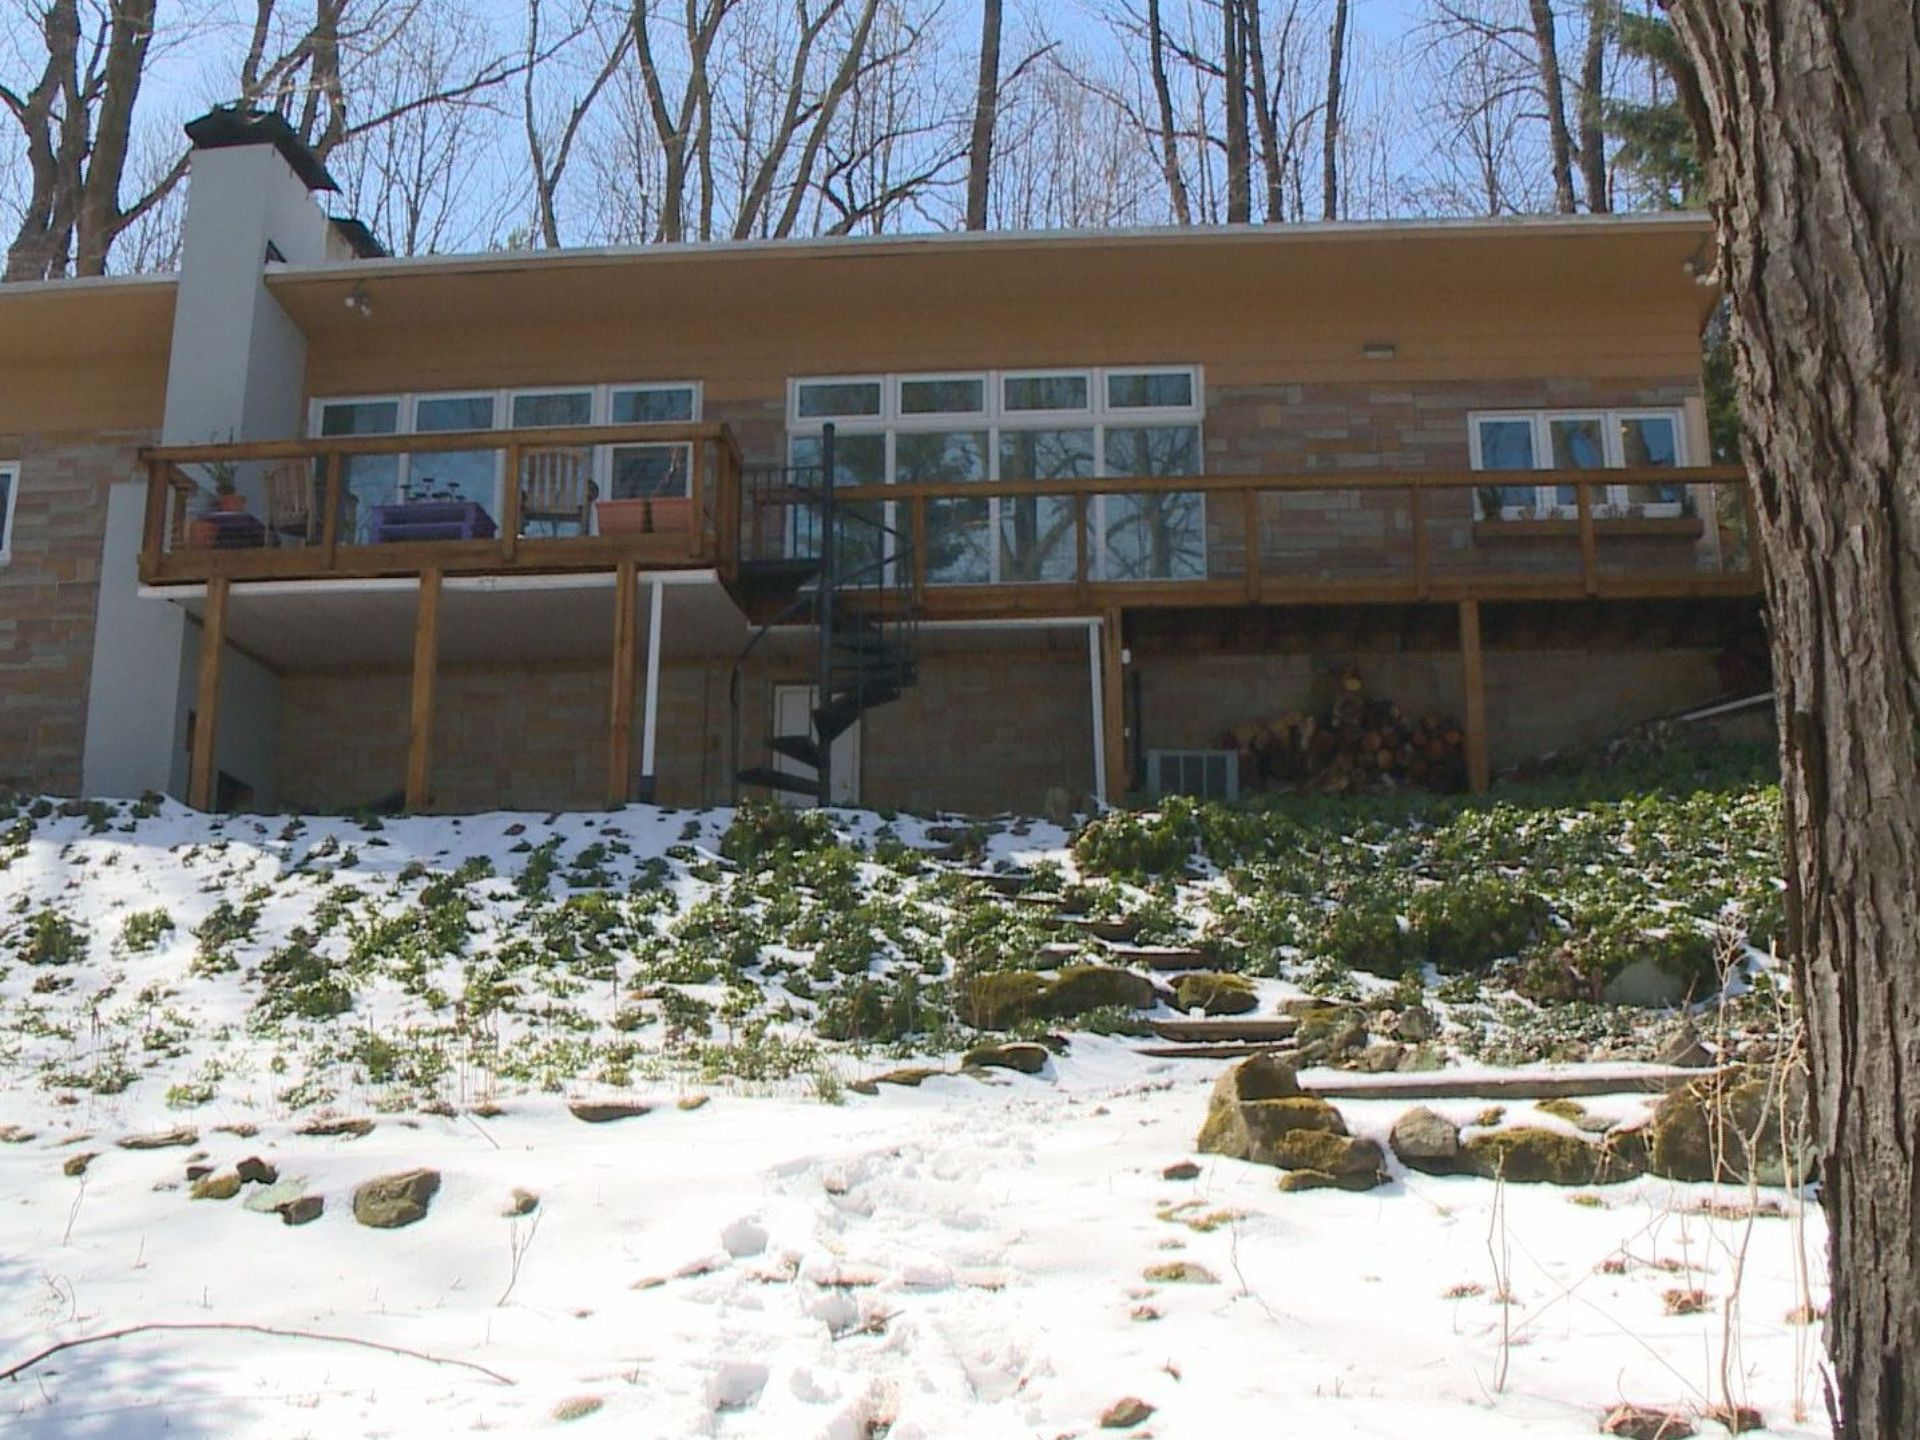 ... Inside Jeffrey Dahmer's childhood home in Northeast Ohio | WKYC.com